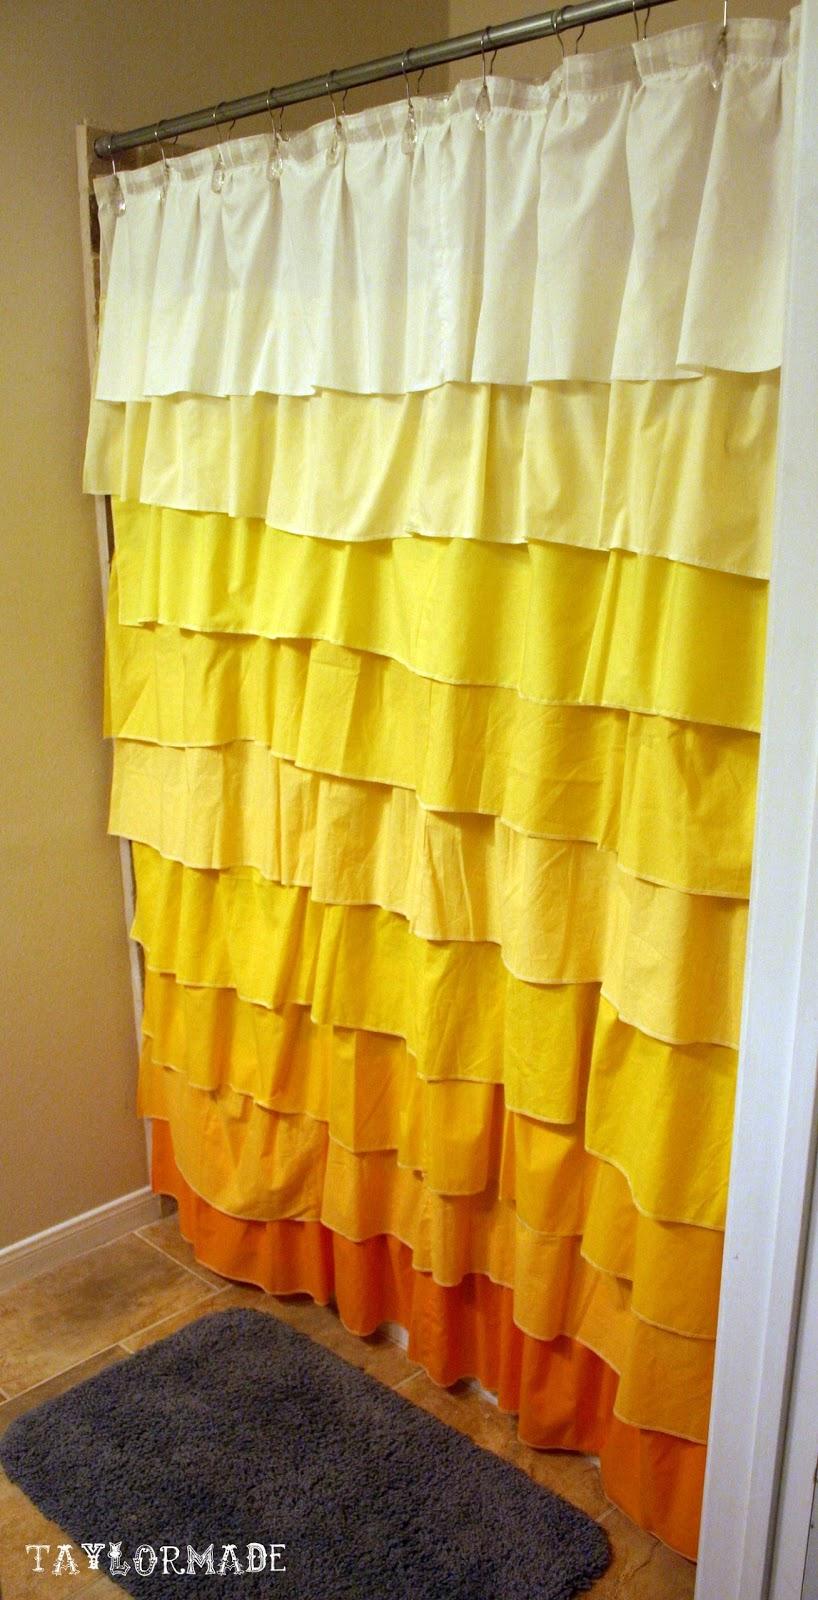 Brand new DIY Anthropologie Flamenco Shower Curtain in Sunshine - TaylorMade LH37